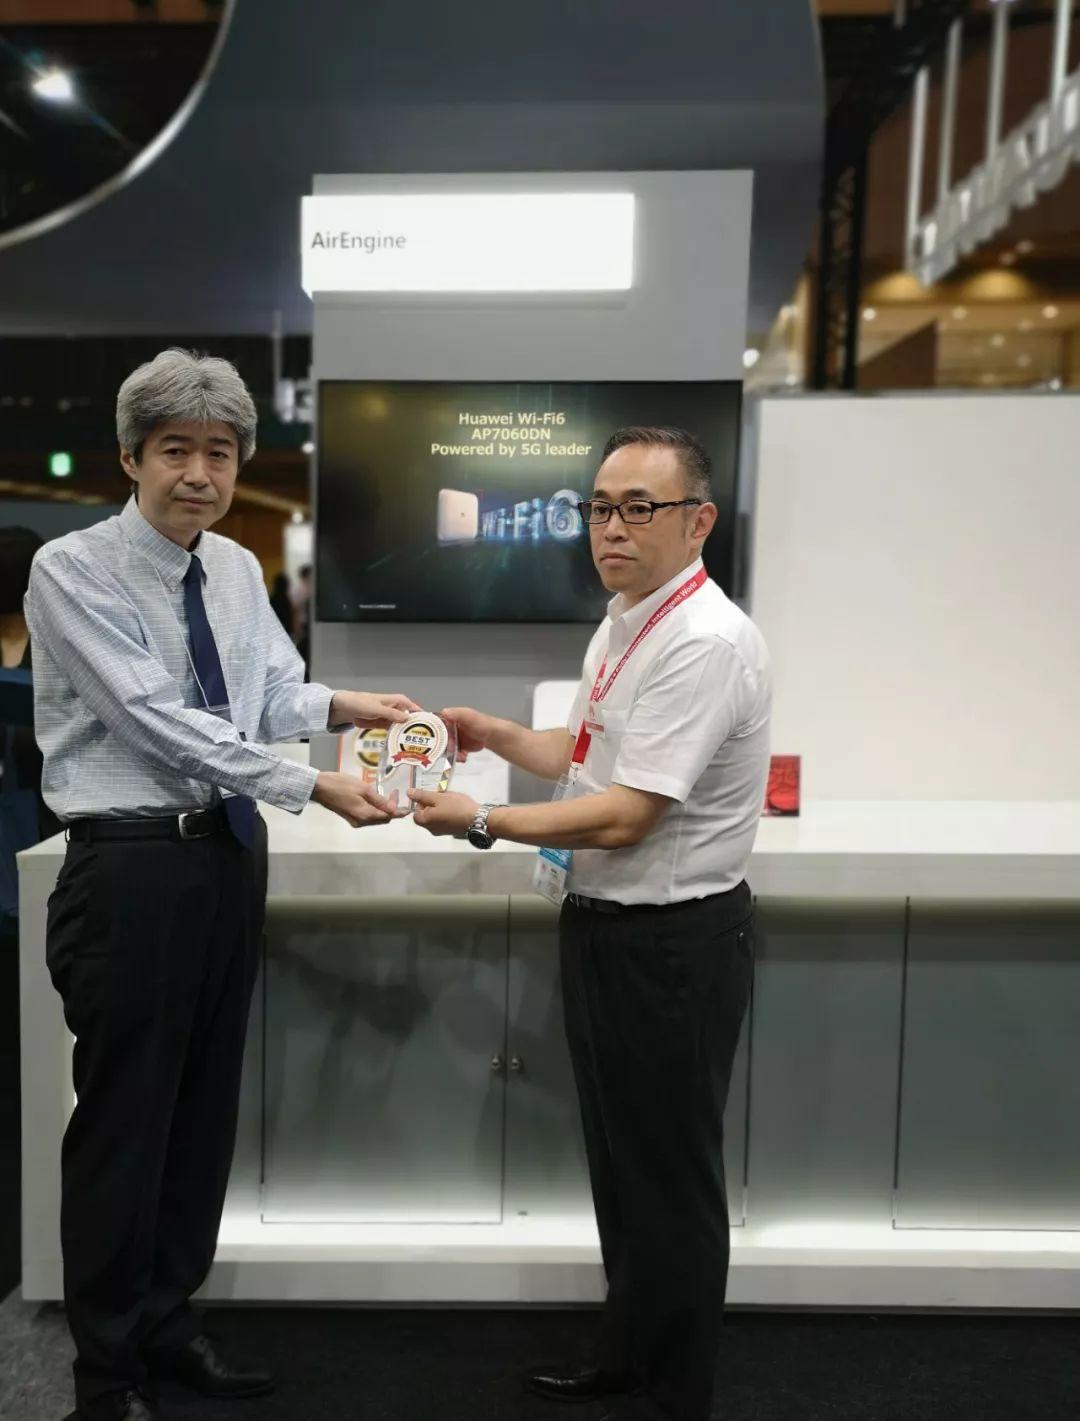 6IuN5LqV56m66ICB5biI5b2x6Zz5YWI6ZSL_喜讯!华为airengine wi-fi 6产品荣获2019 interop东京 金奖